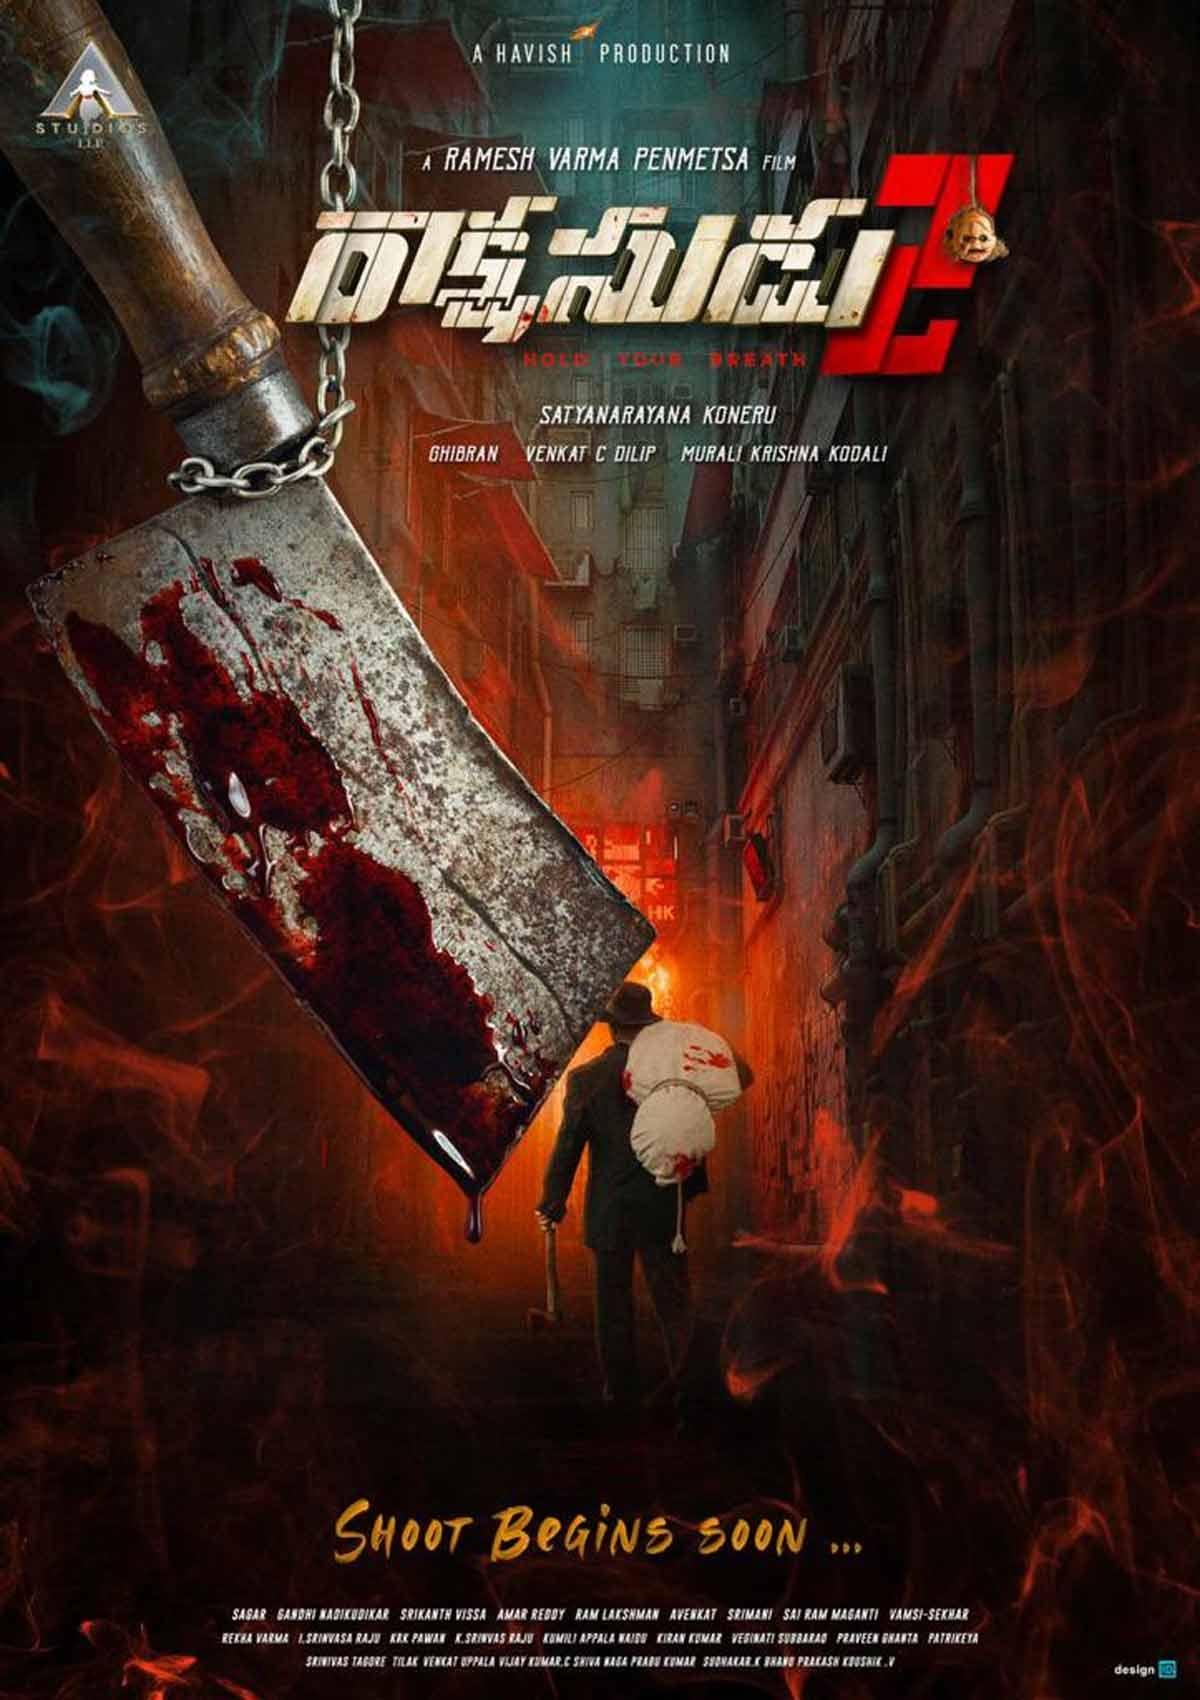 Rakshasudu 2 announced as a sequel